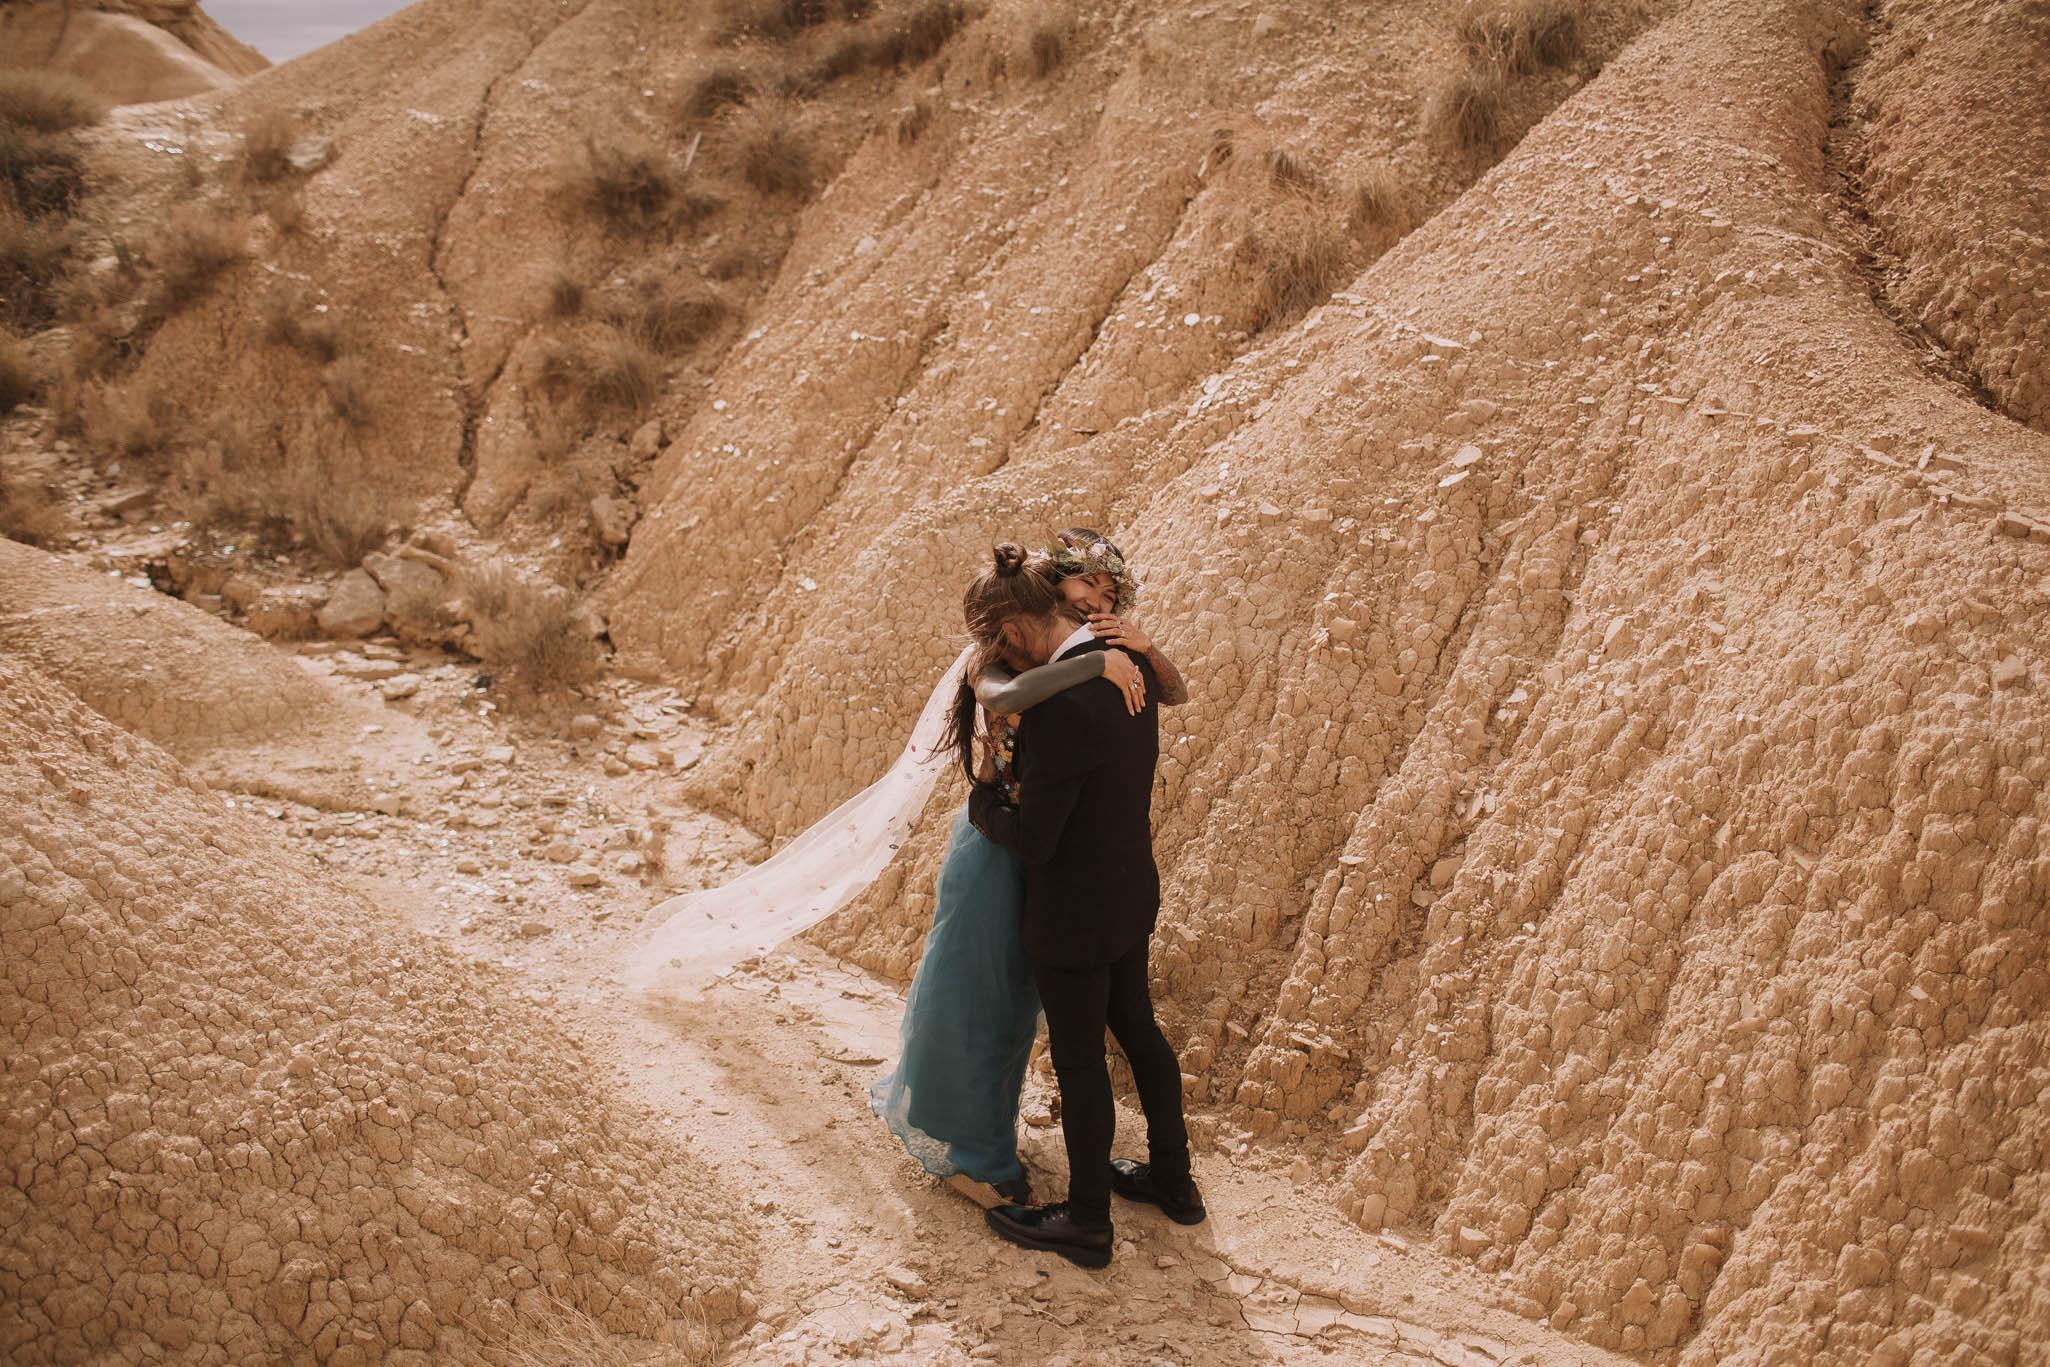 Spain-wedding-photographer-bardenas-reales-jeremy-boyer-photographe-mariage-bordeaux-floral-wedding-dress-robe-82.jpg